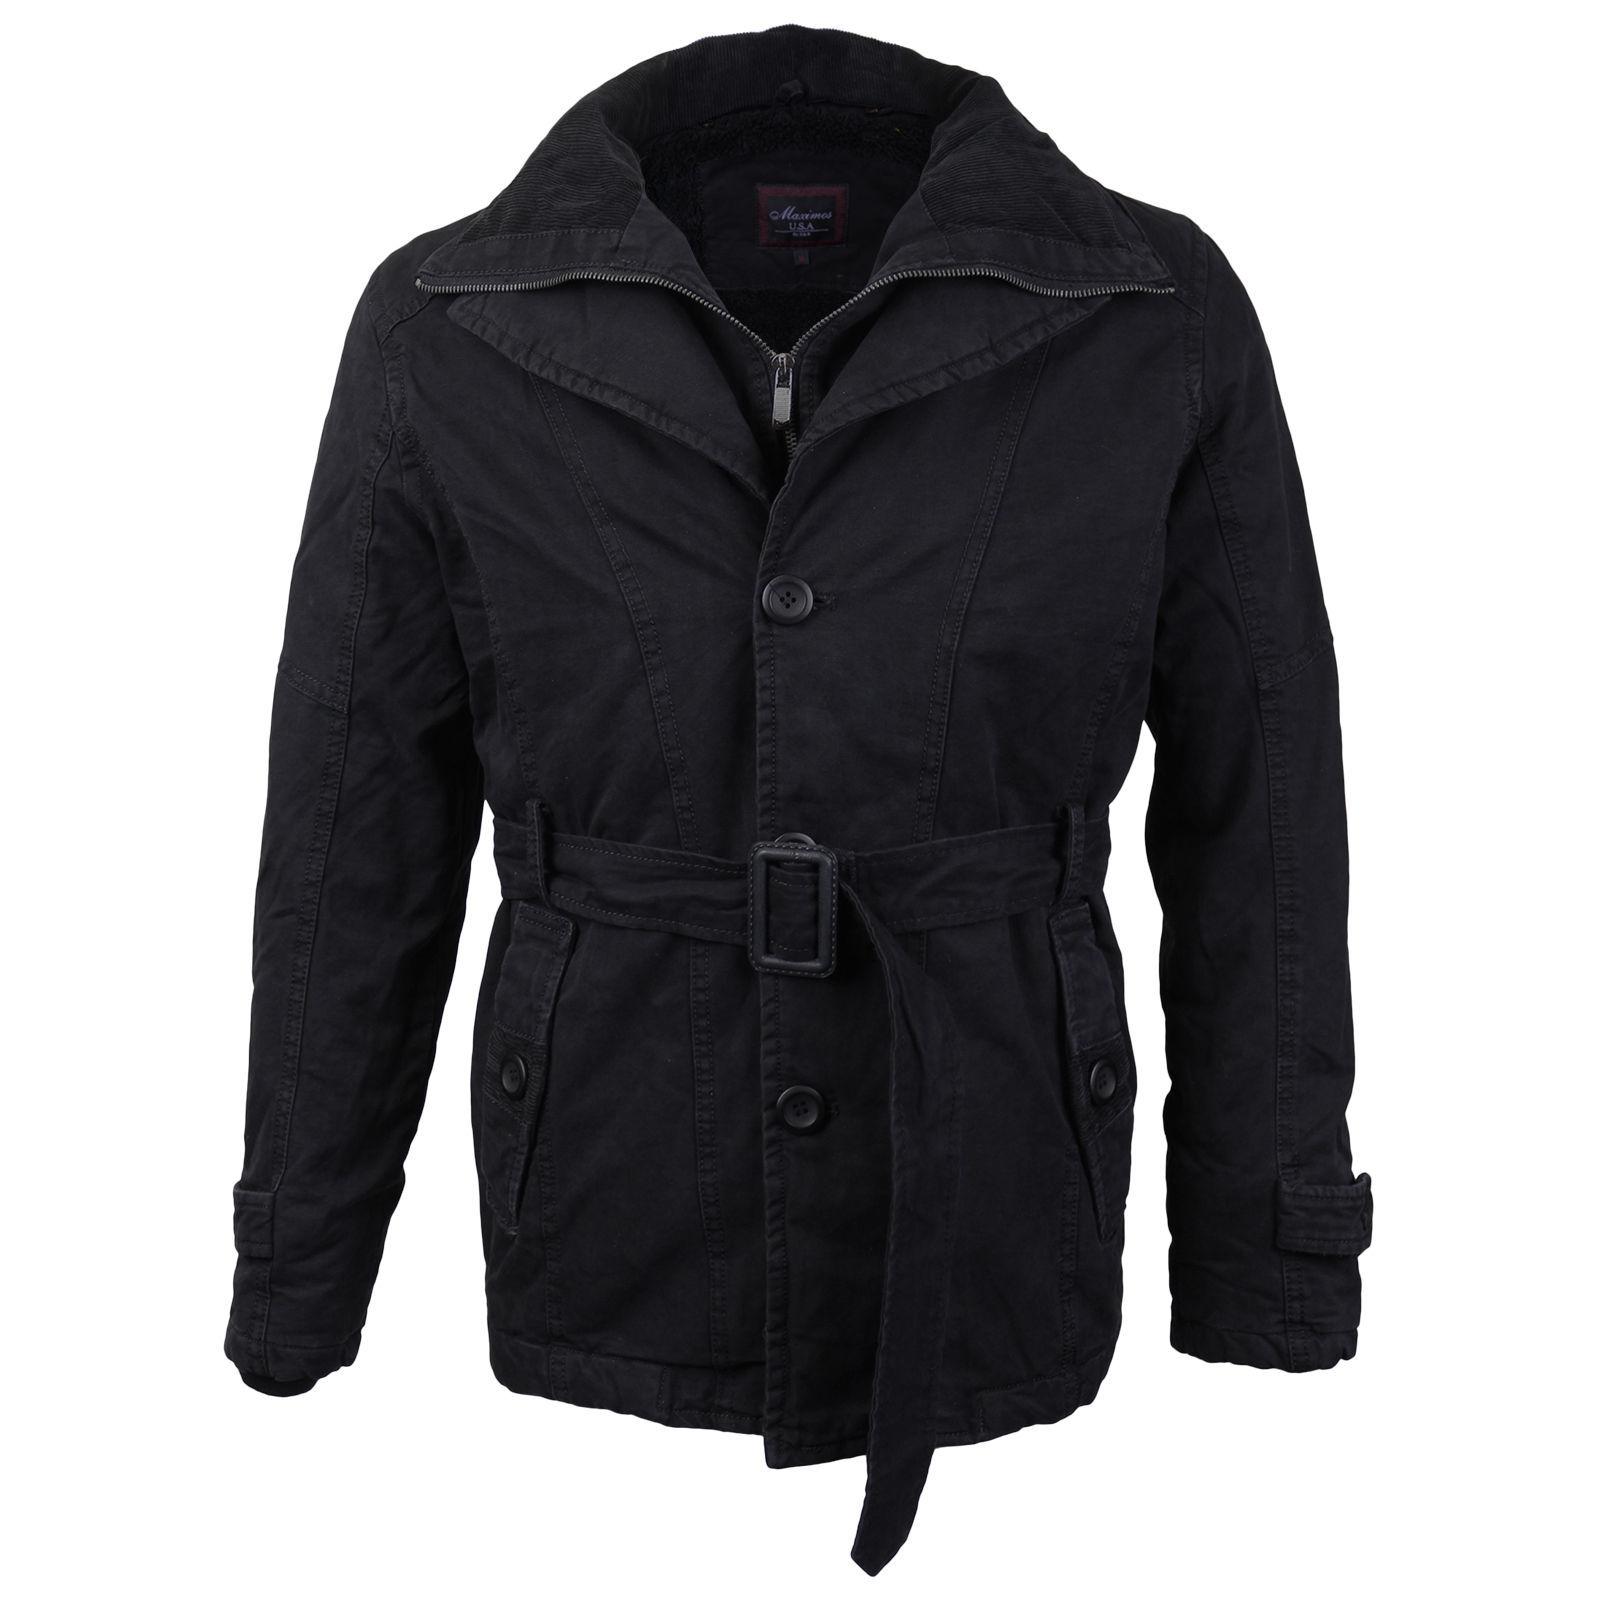 Maximos Men's Multi Layered Belted Modern Norfolk Trench Pea Coat Jacket EMMA-01